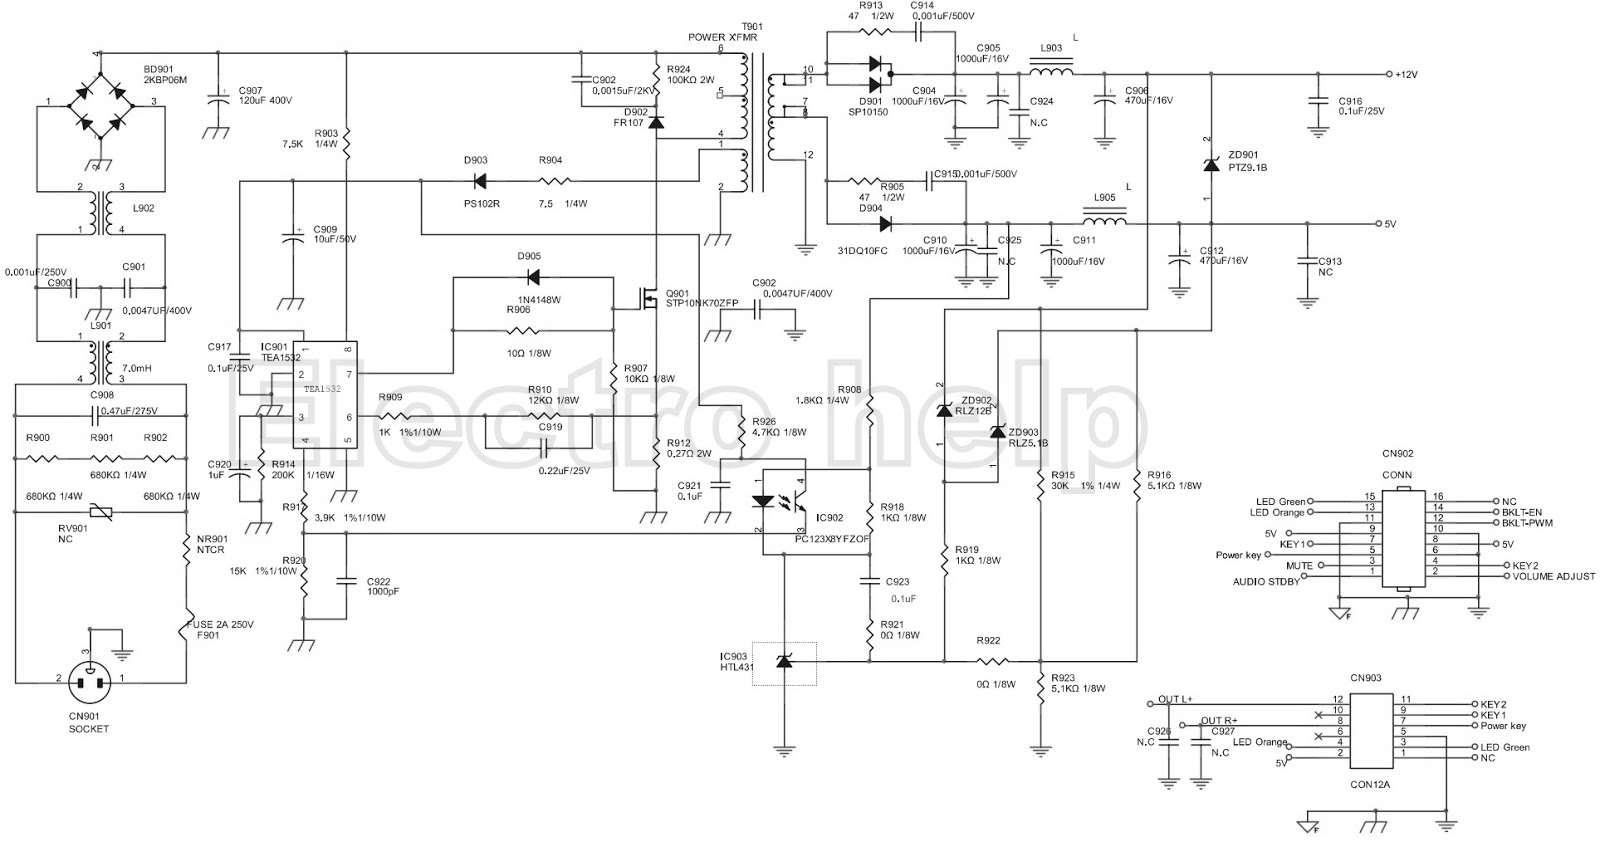 crt monitor schematic diagram